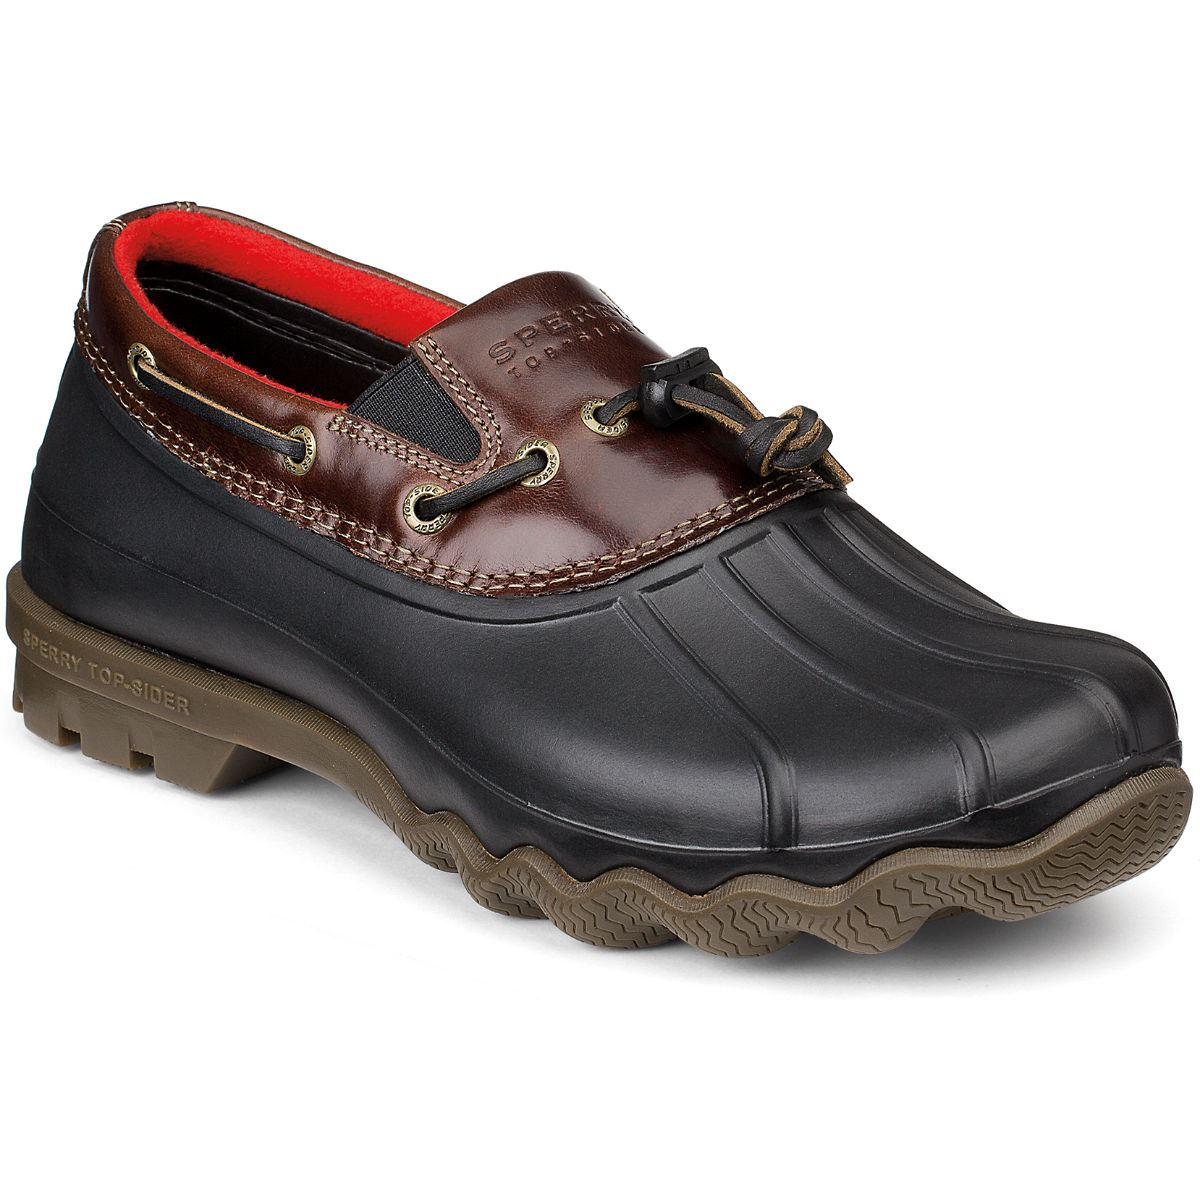 Sperry Top-Sider Men's Striper CVO Cap Fashion Sneaker, Coral, M US.